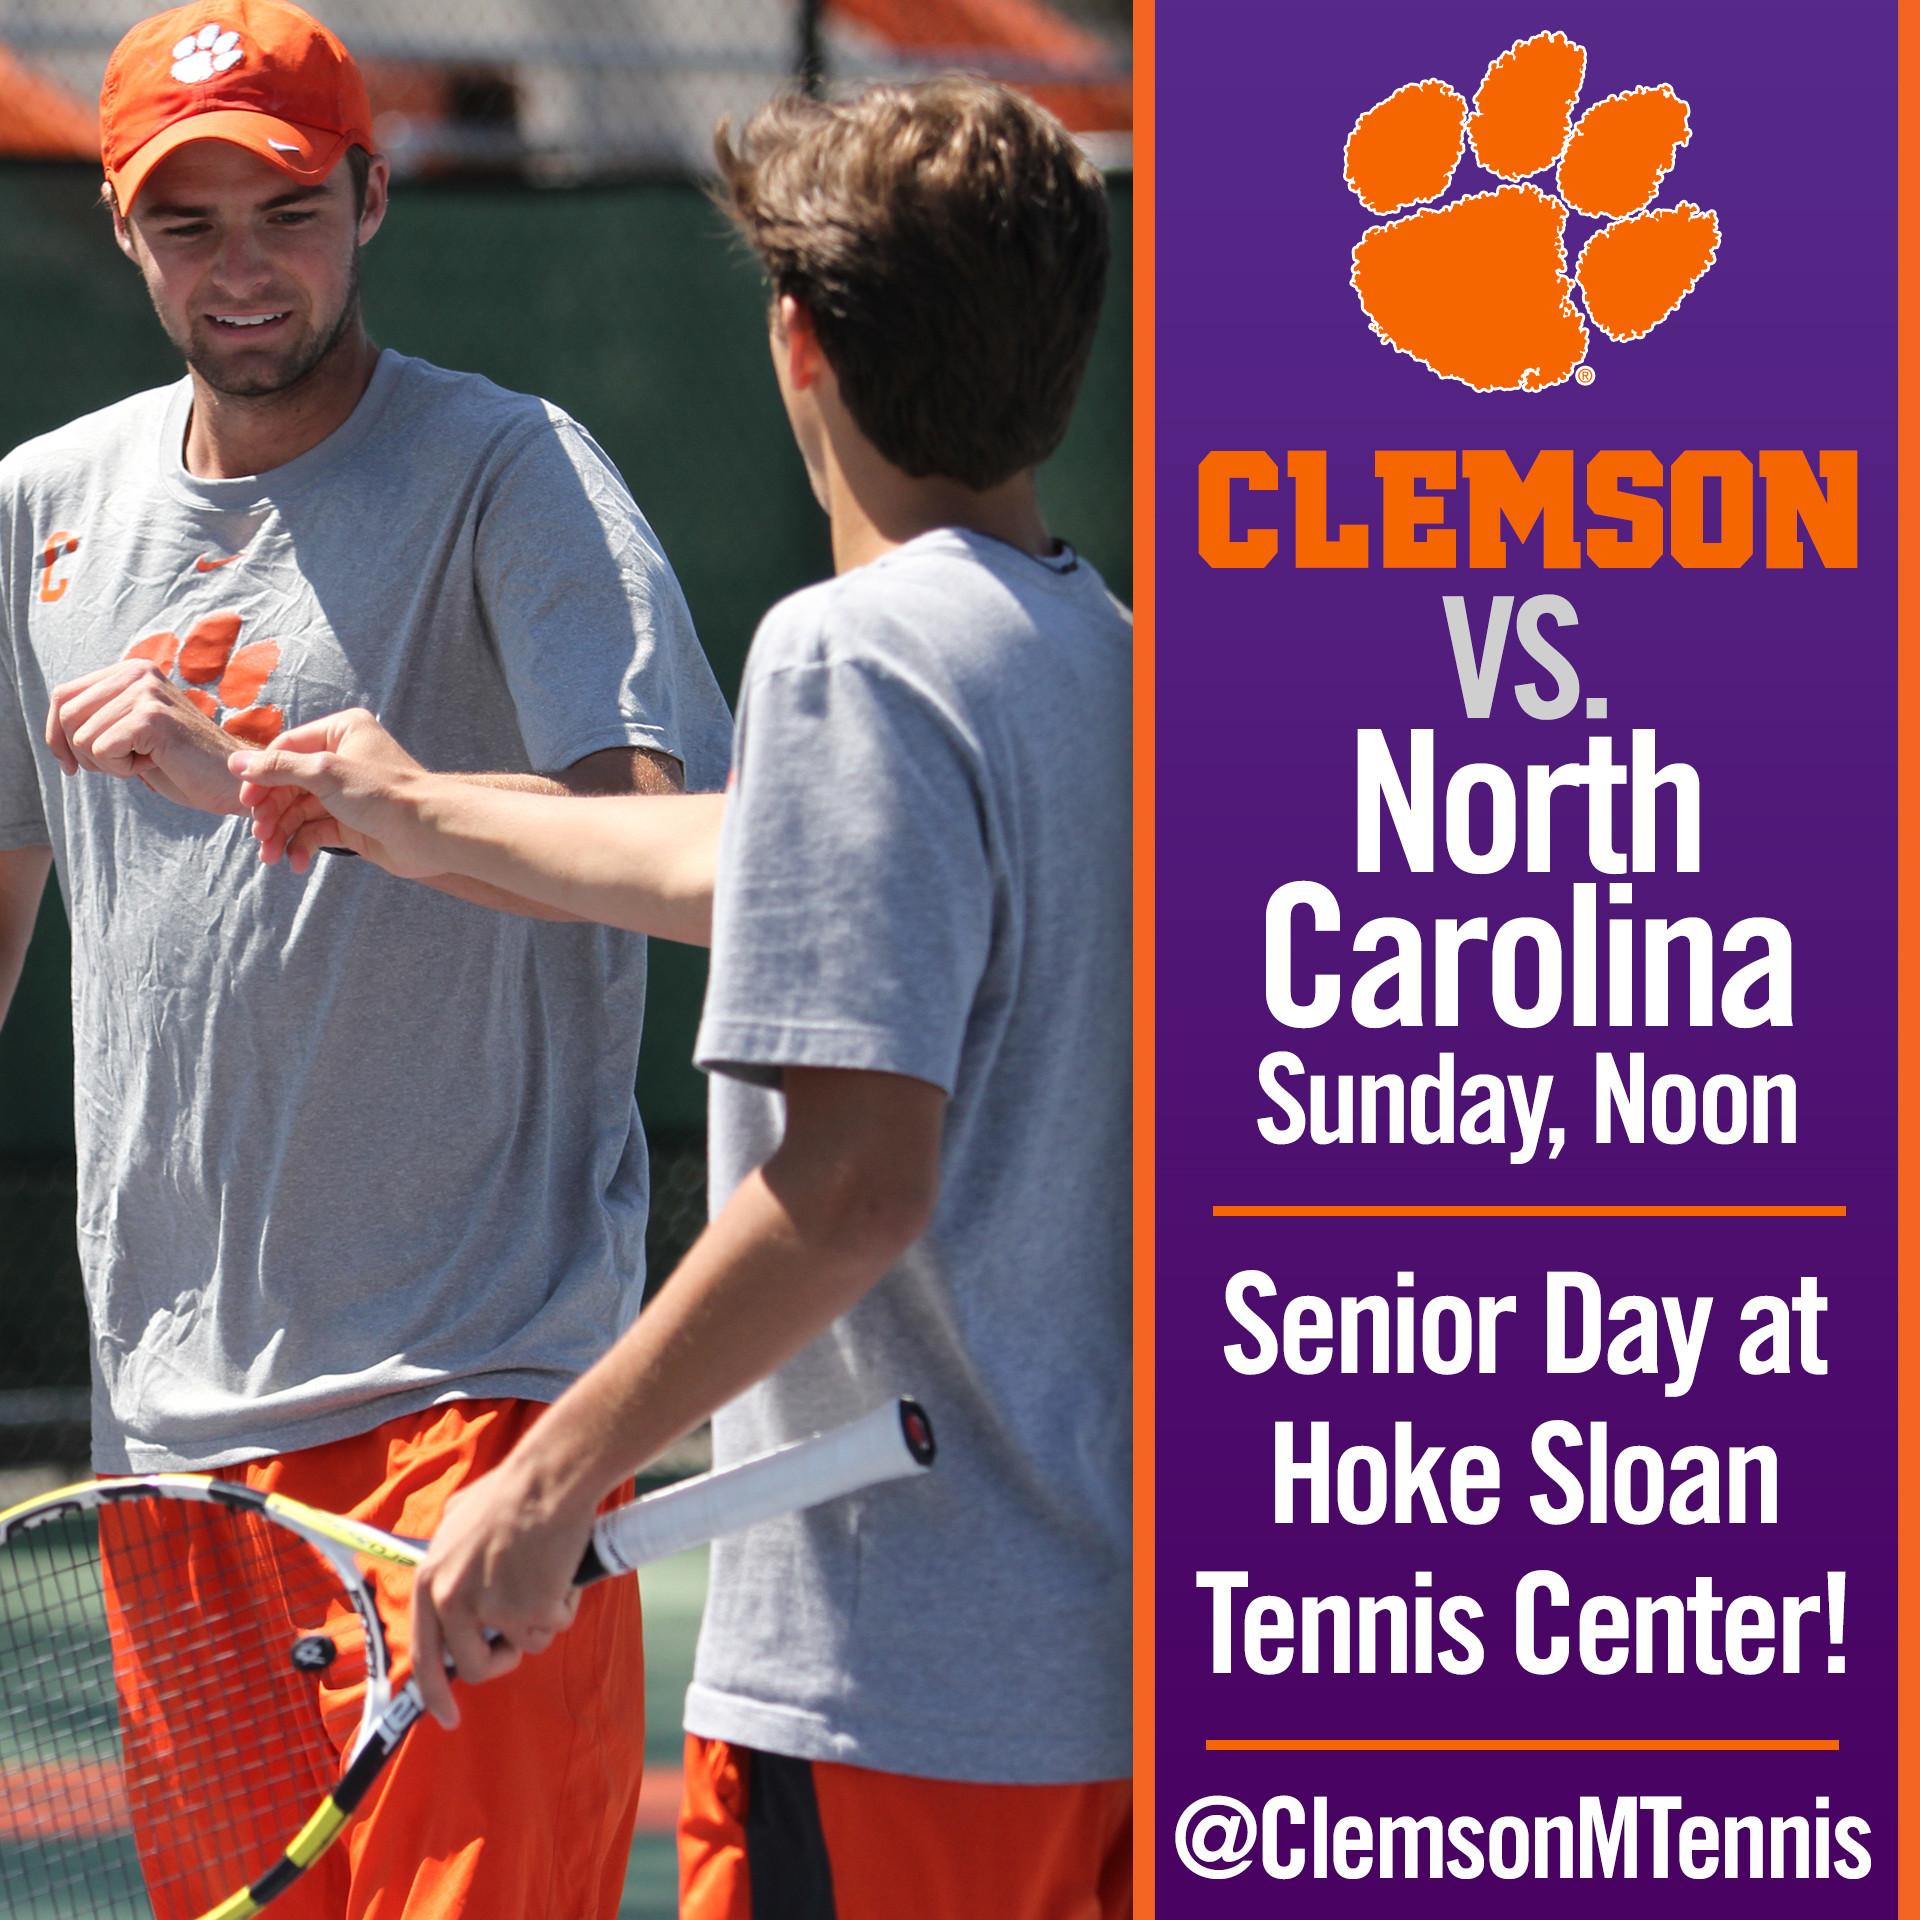 Clemson Hosts No. 15 North Carolina in Final Home Match on Sunday